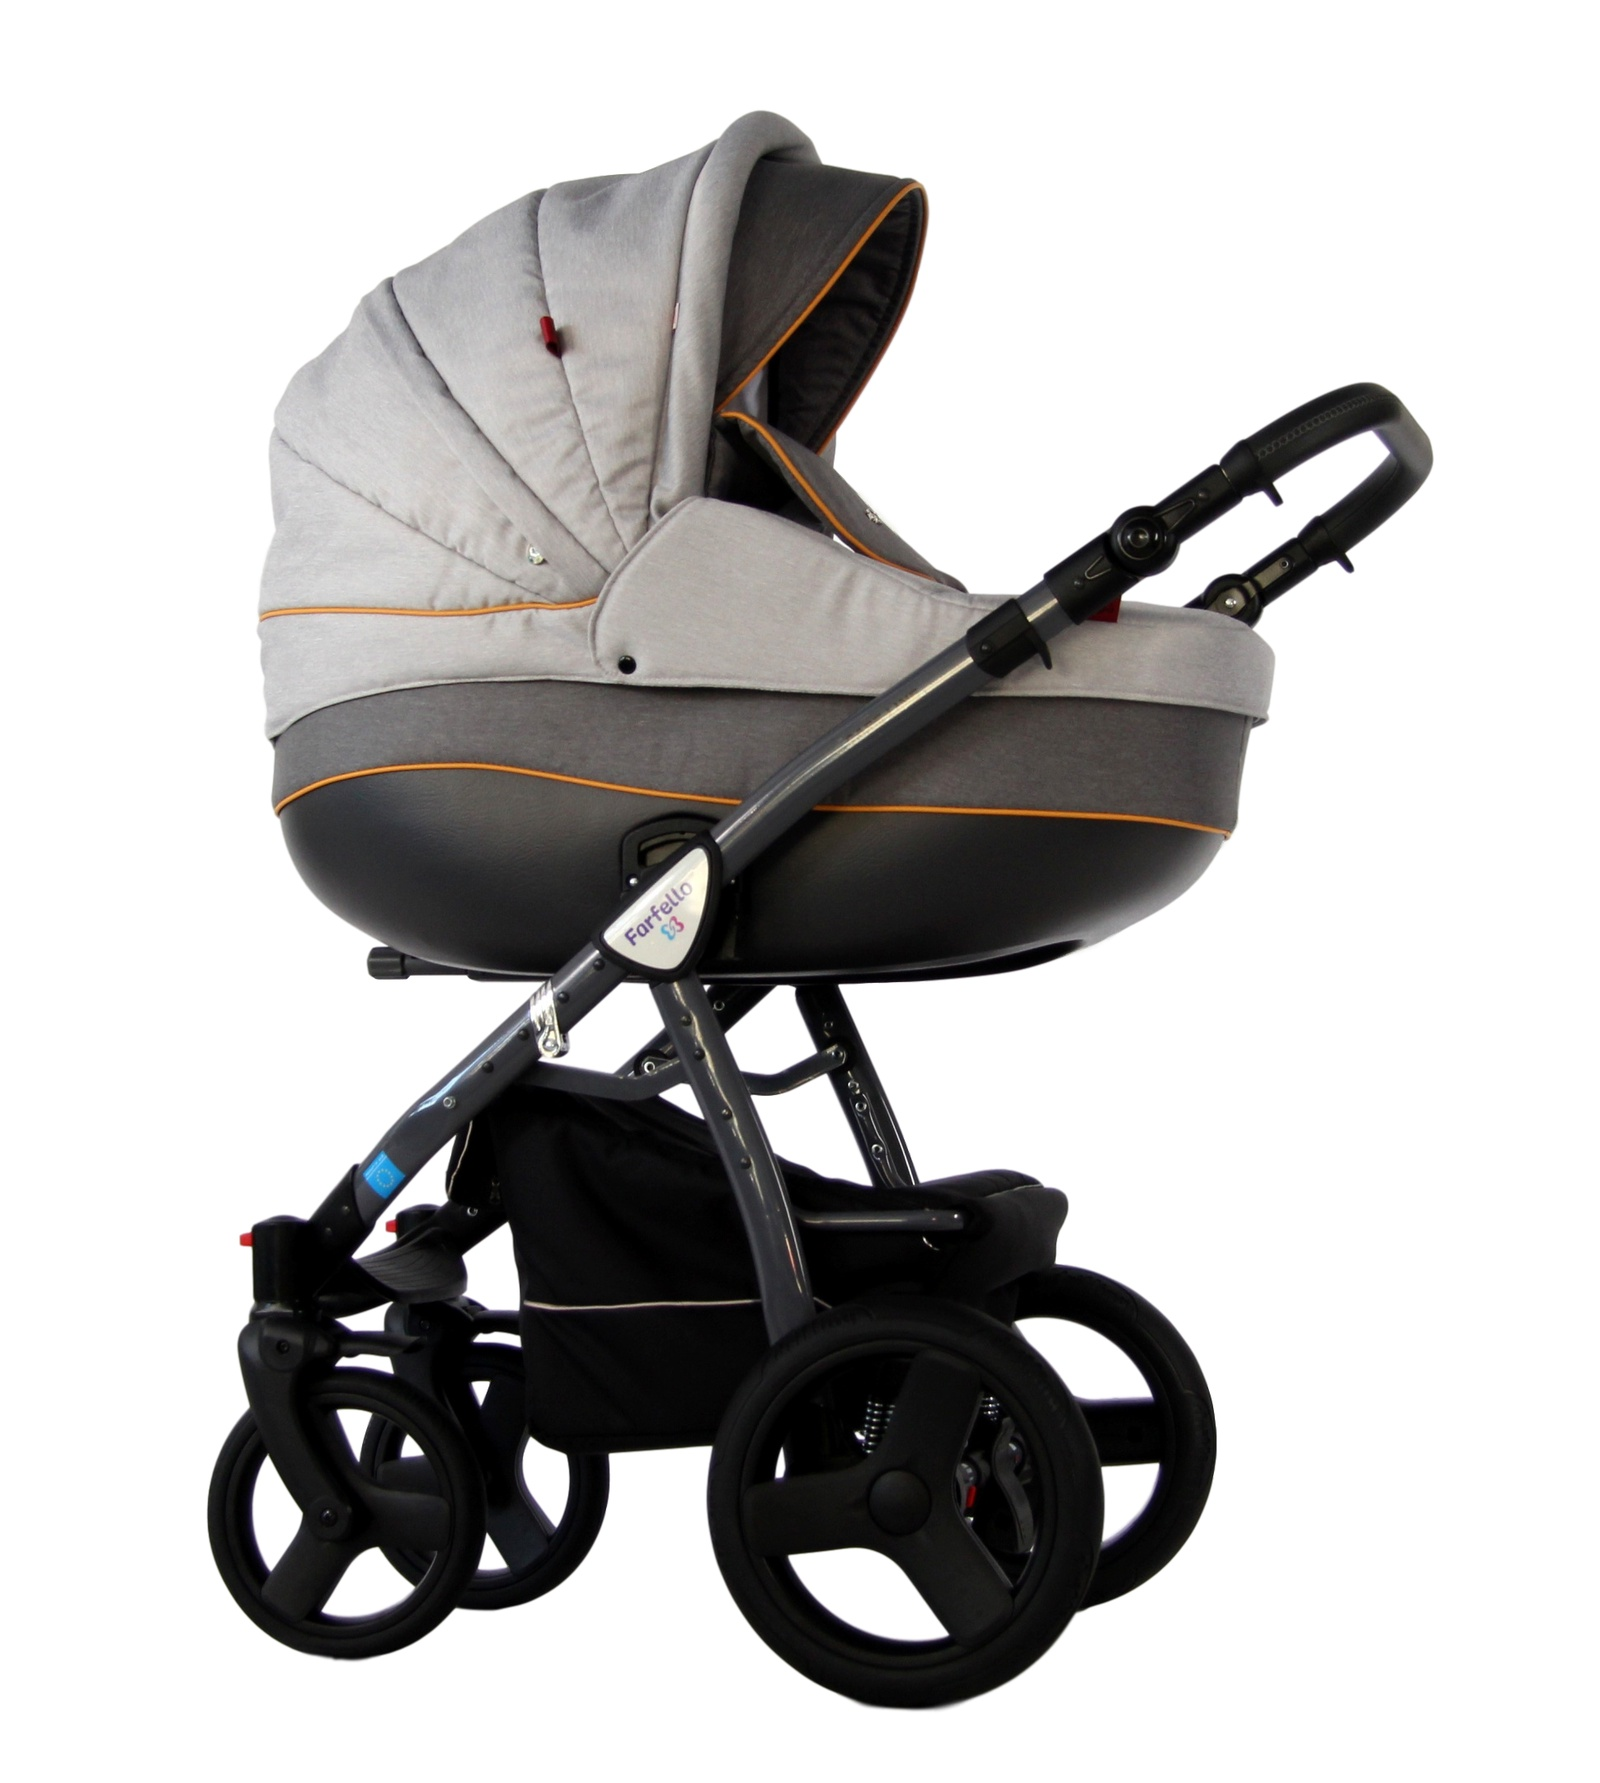 Коляска-люлька Farfello CARE-LINE 2в1 светло-серый коляска модульная vikalex ferrone 2 в 1 leather white vi72301